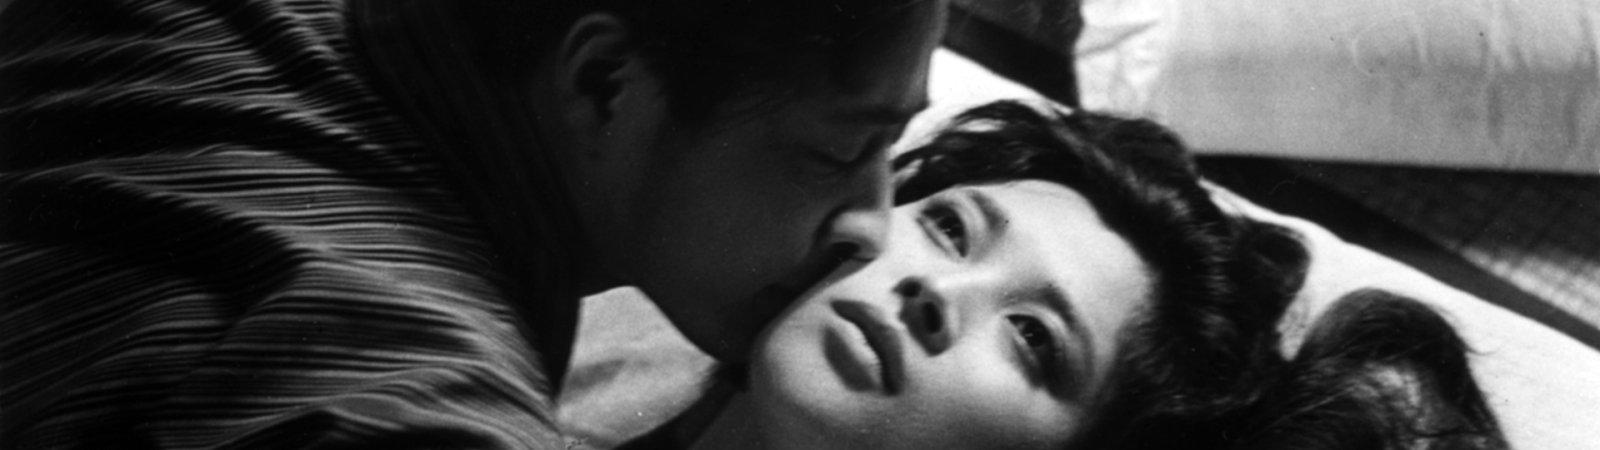 Photo du film : La source thermale d'Akitsu